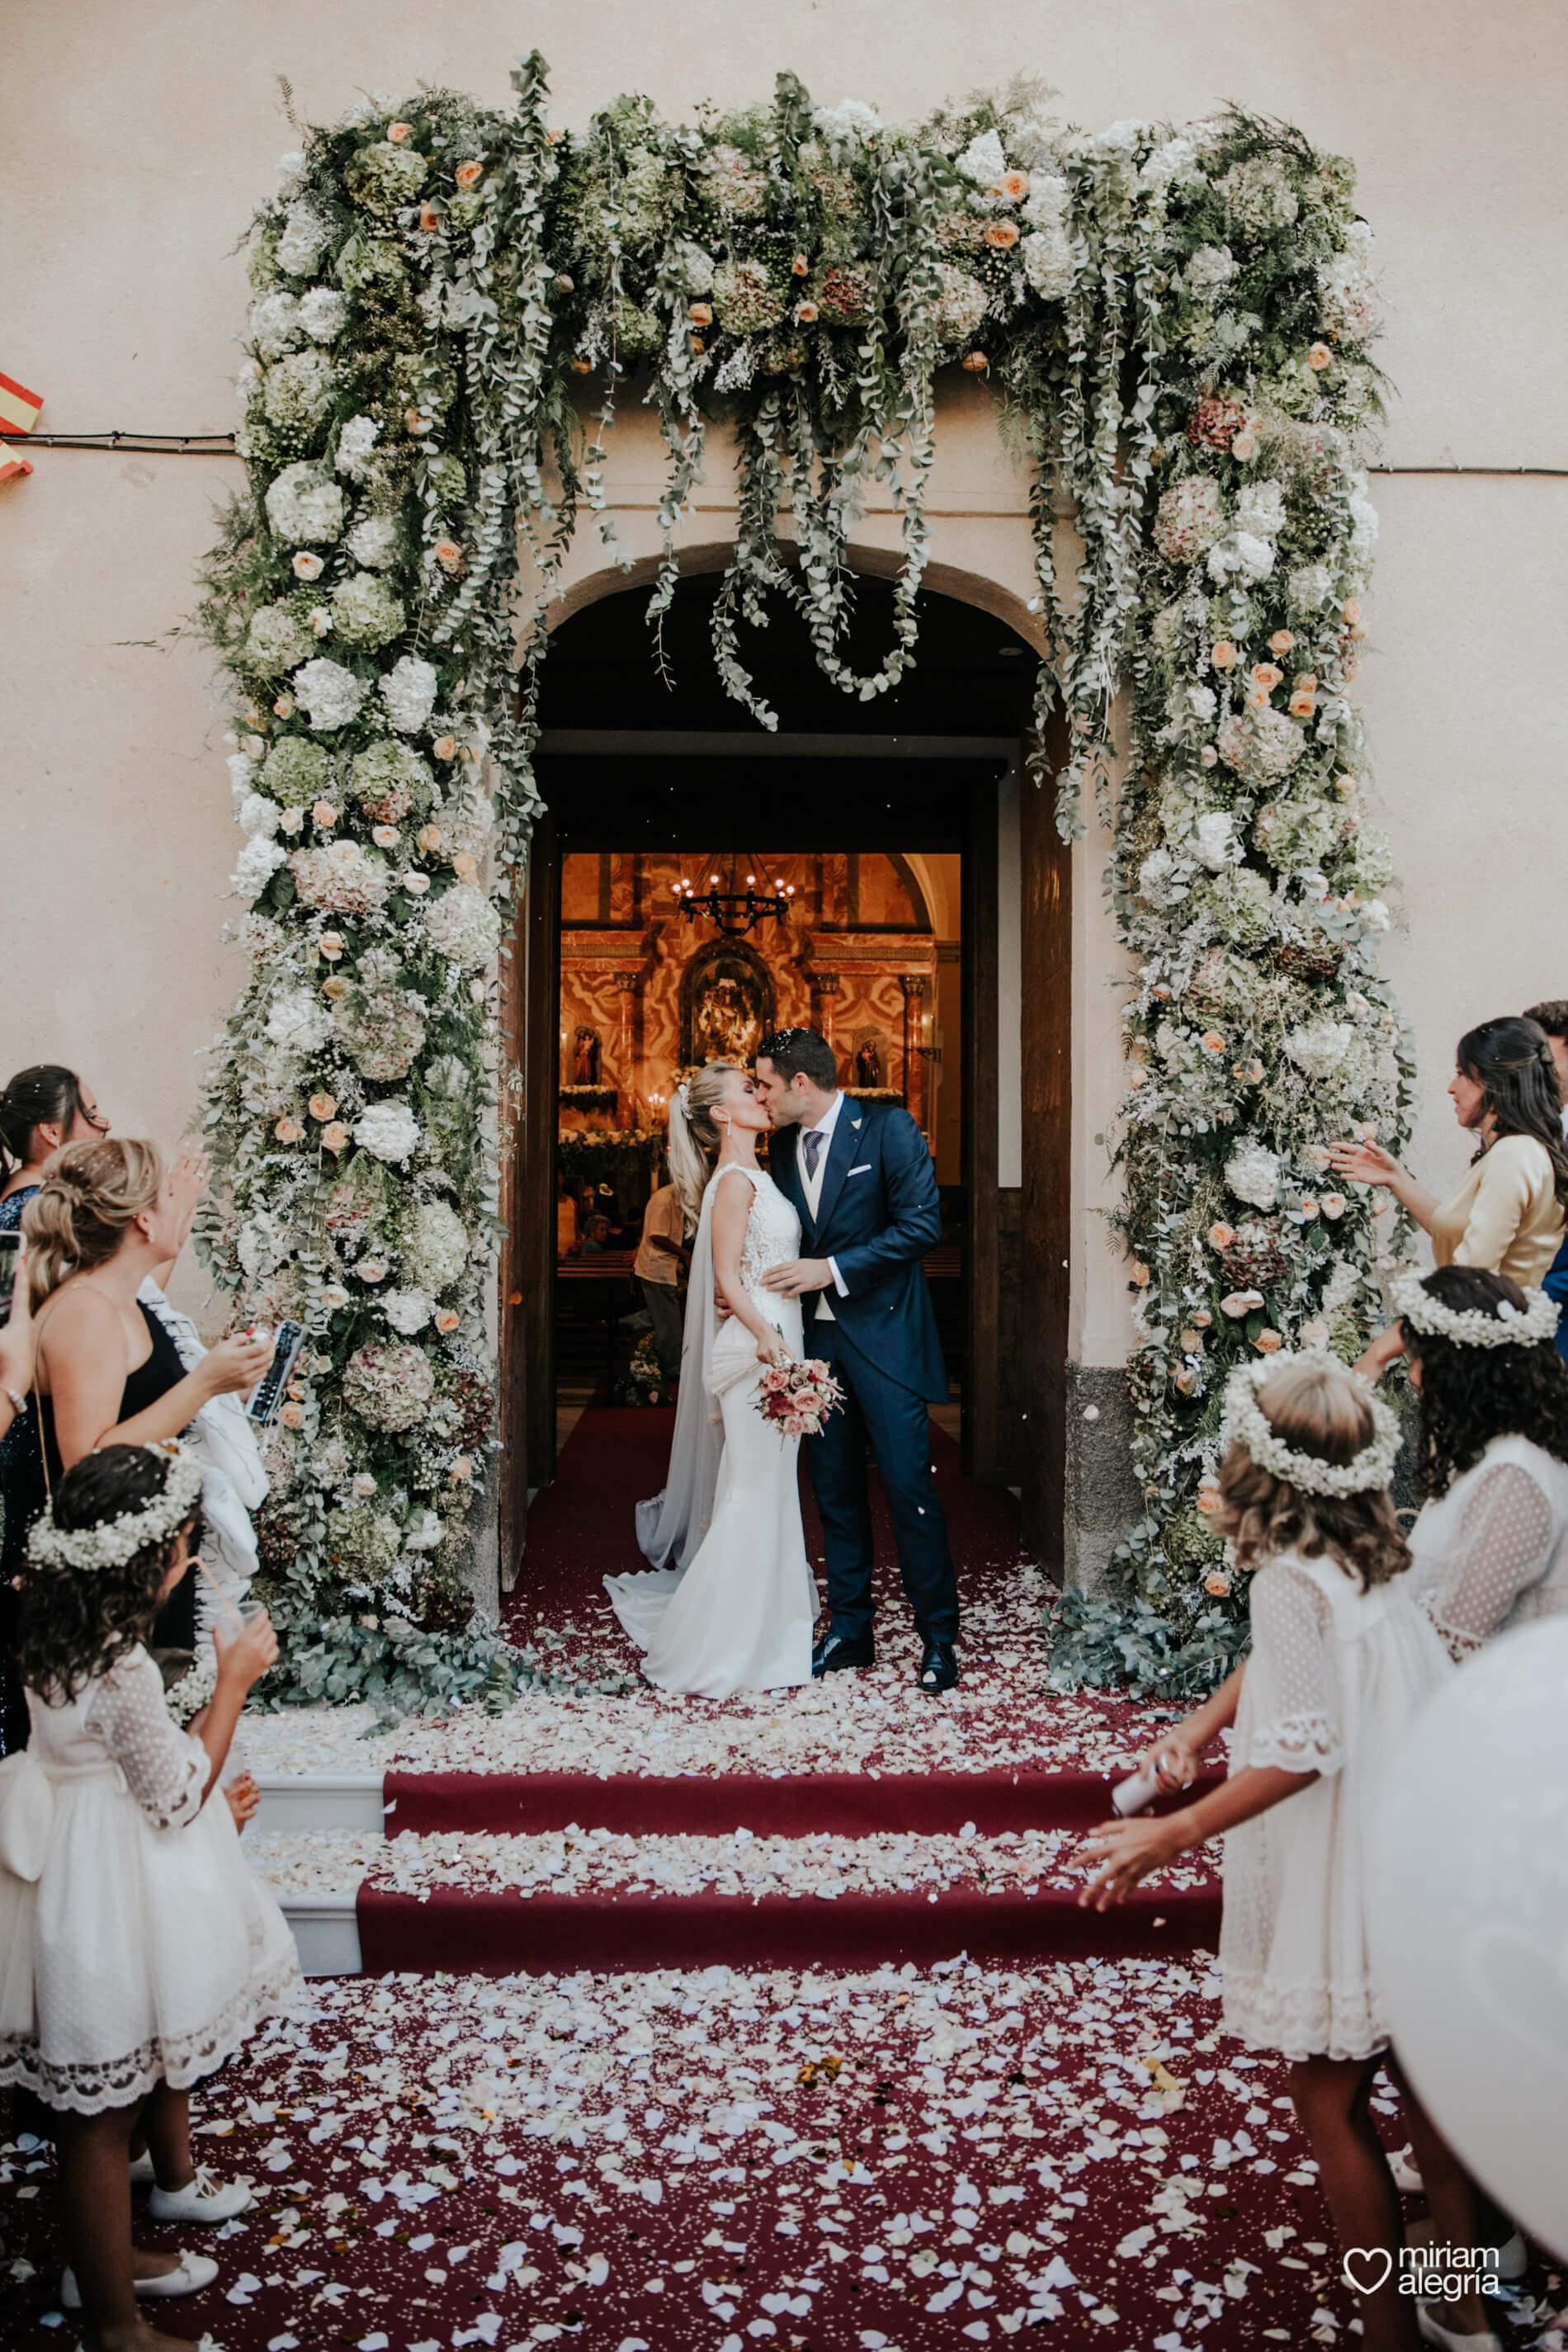 boda-en-almeria-miriam-alegria-134